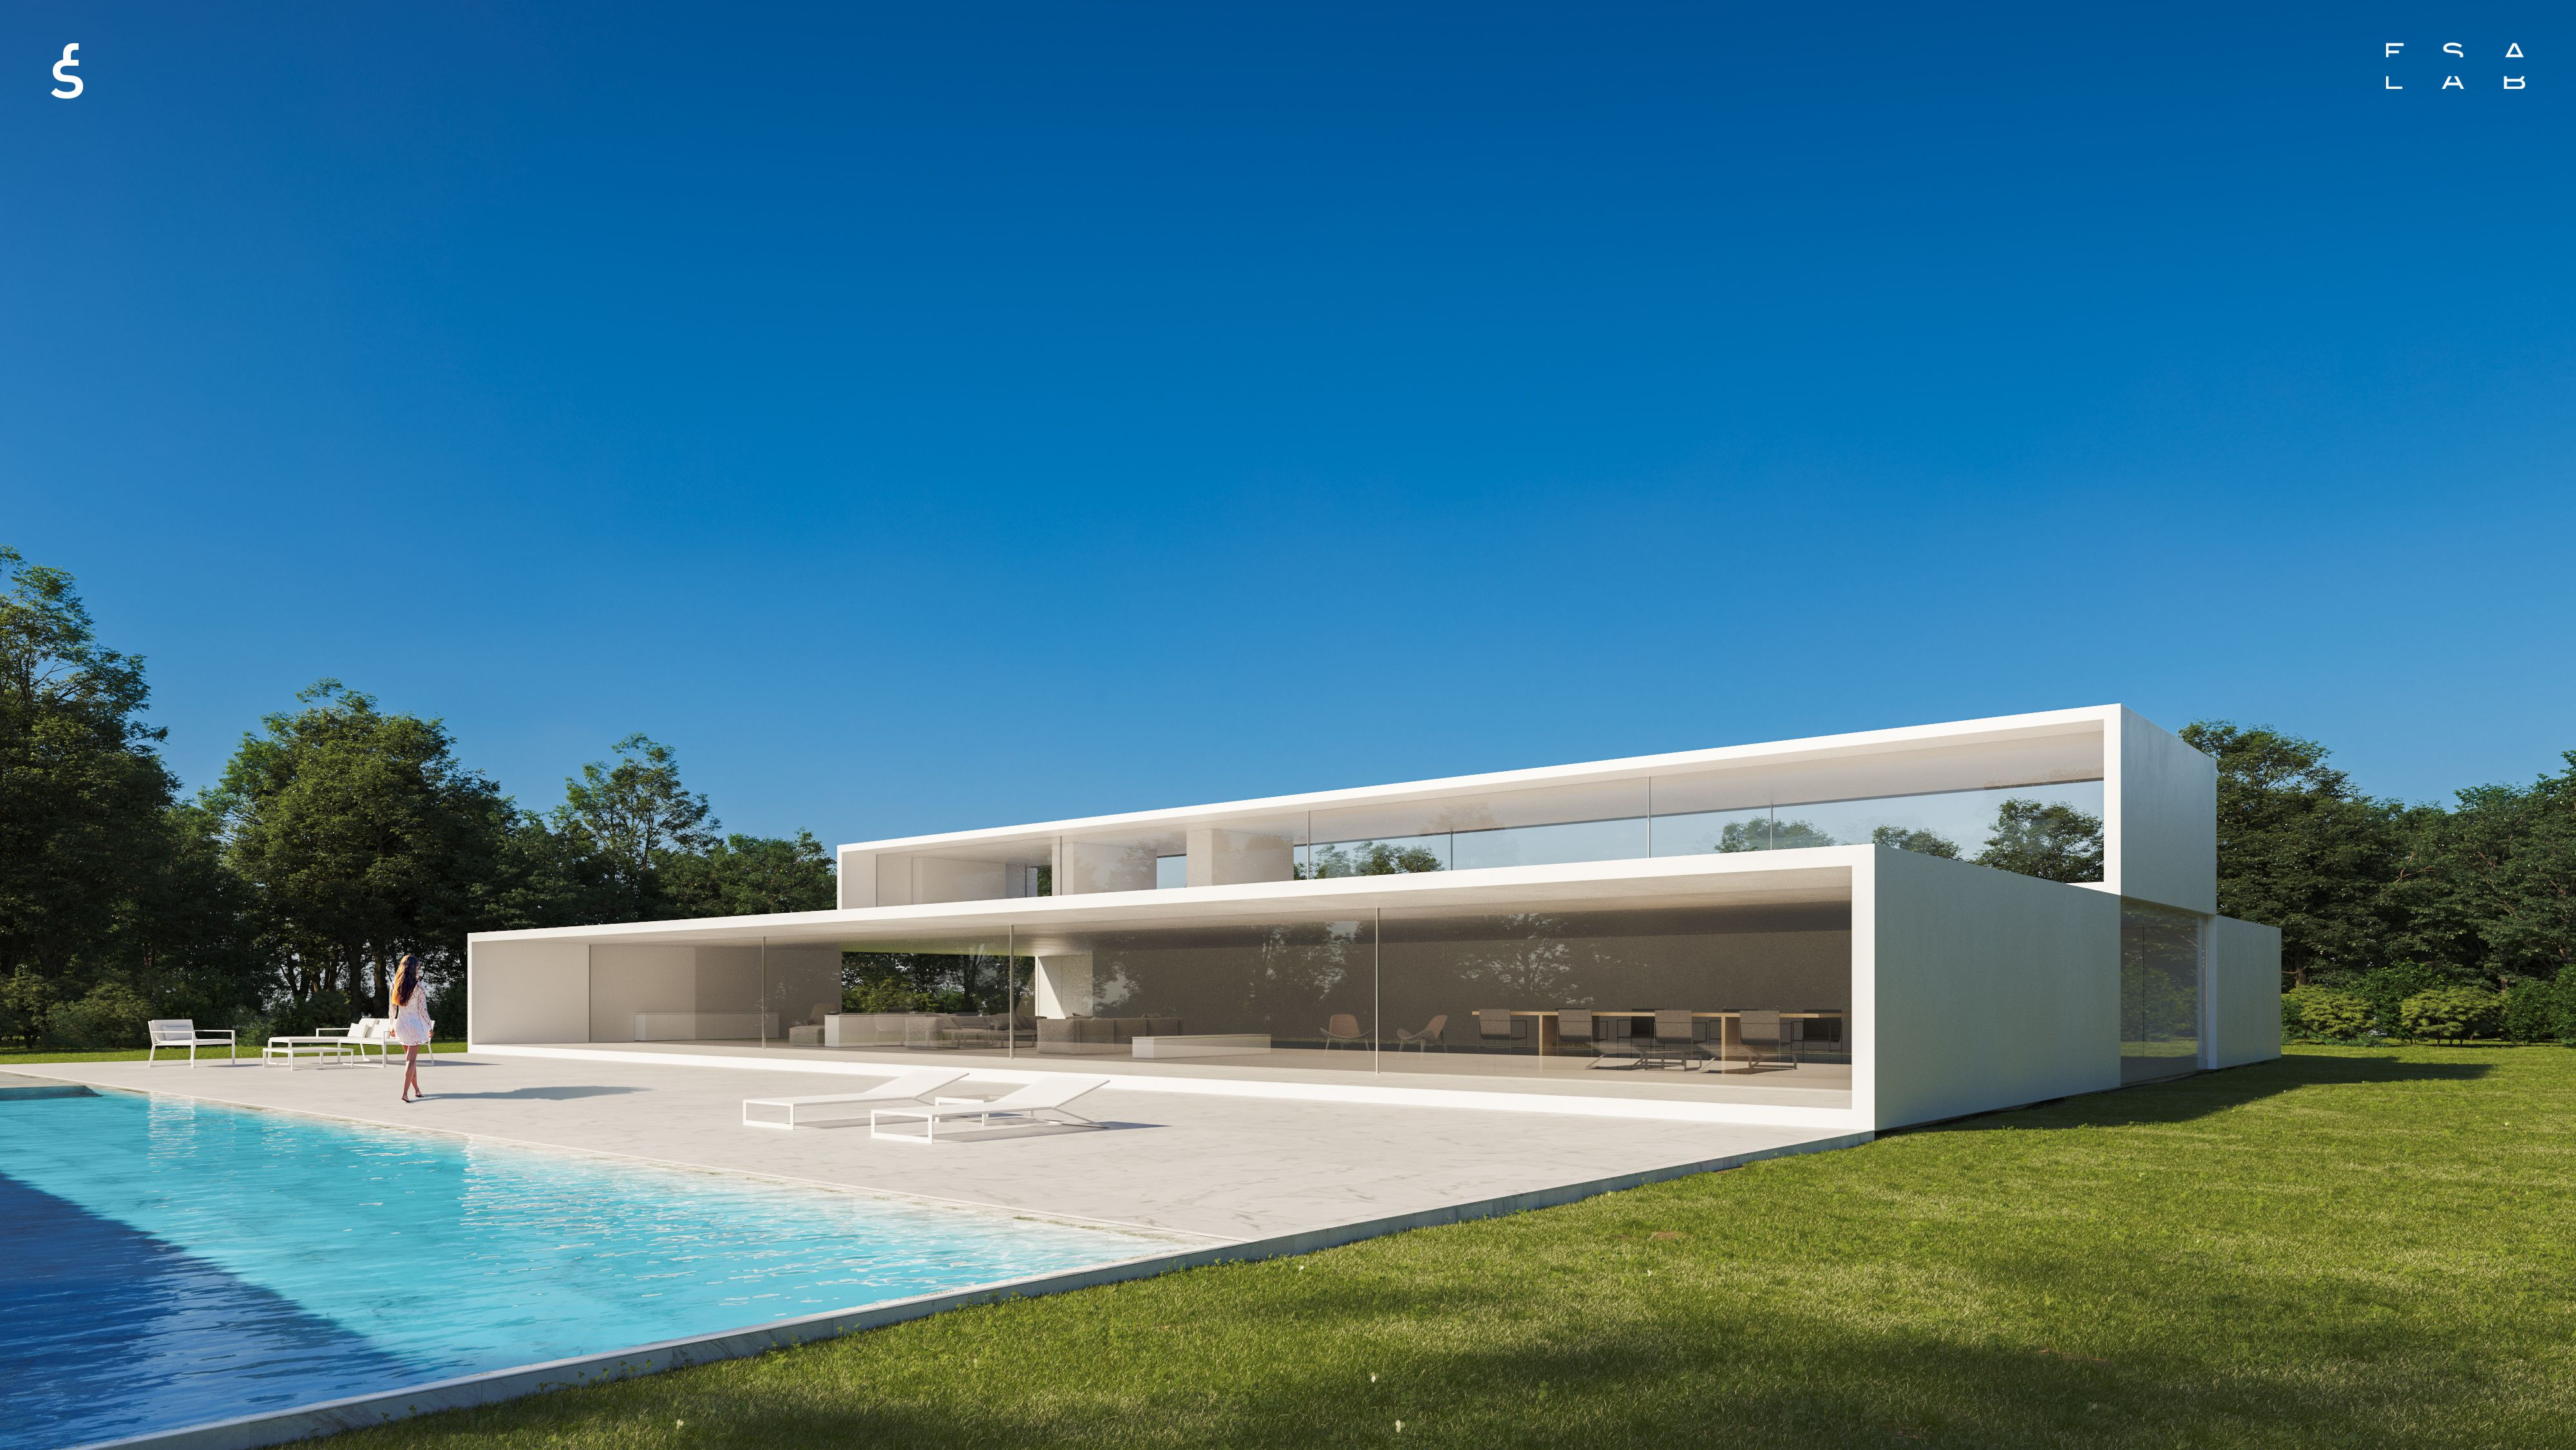 Arquitectos Valencia | FRAN SILVESTRE ARQUITECTOS™